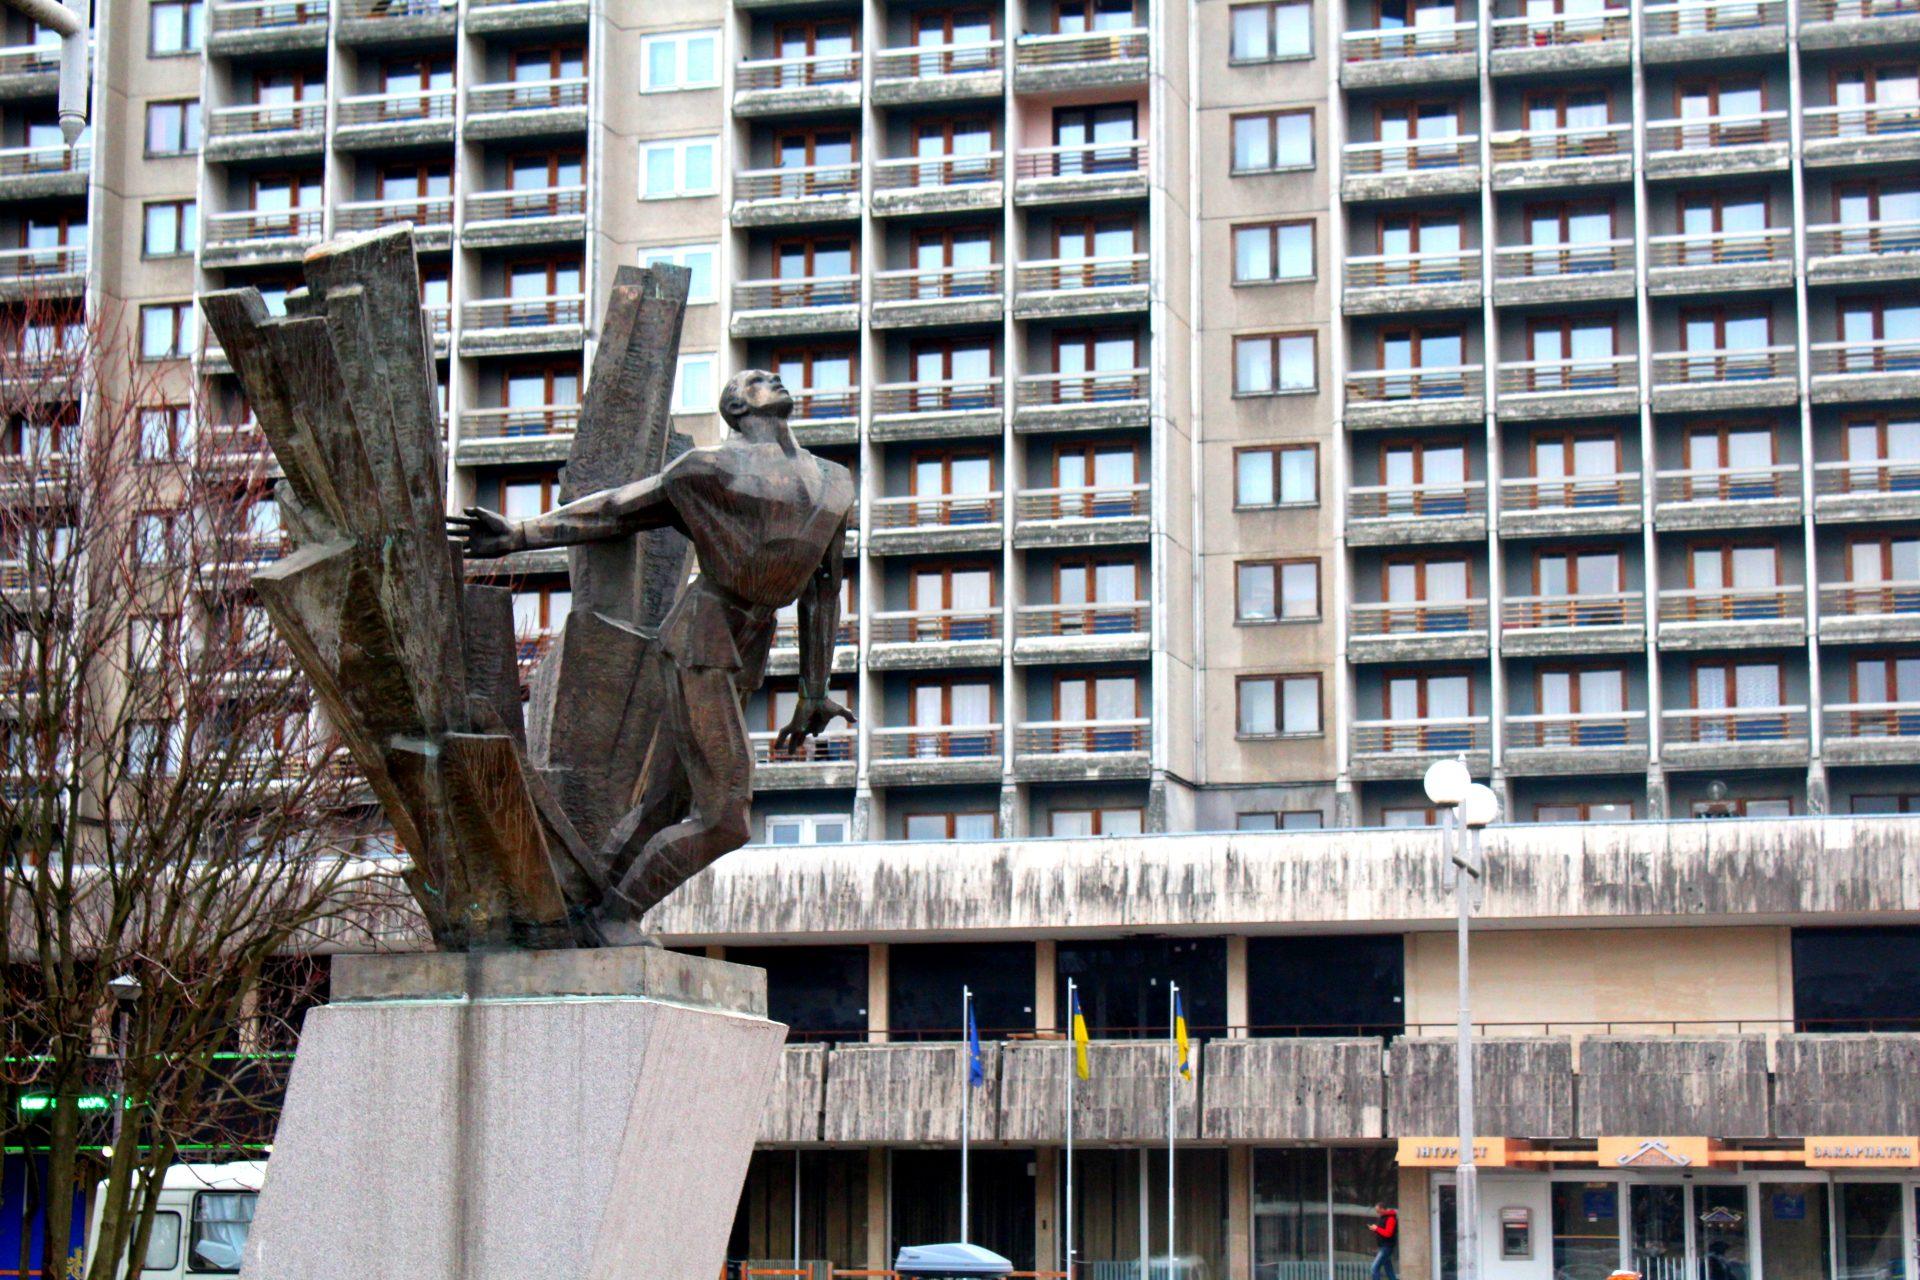 Ужгород: огризок радянщини на межі з ЄС